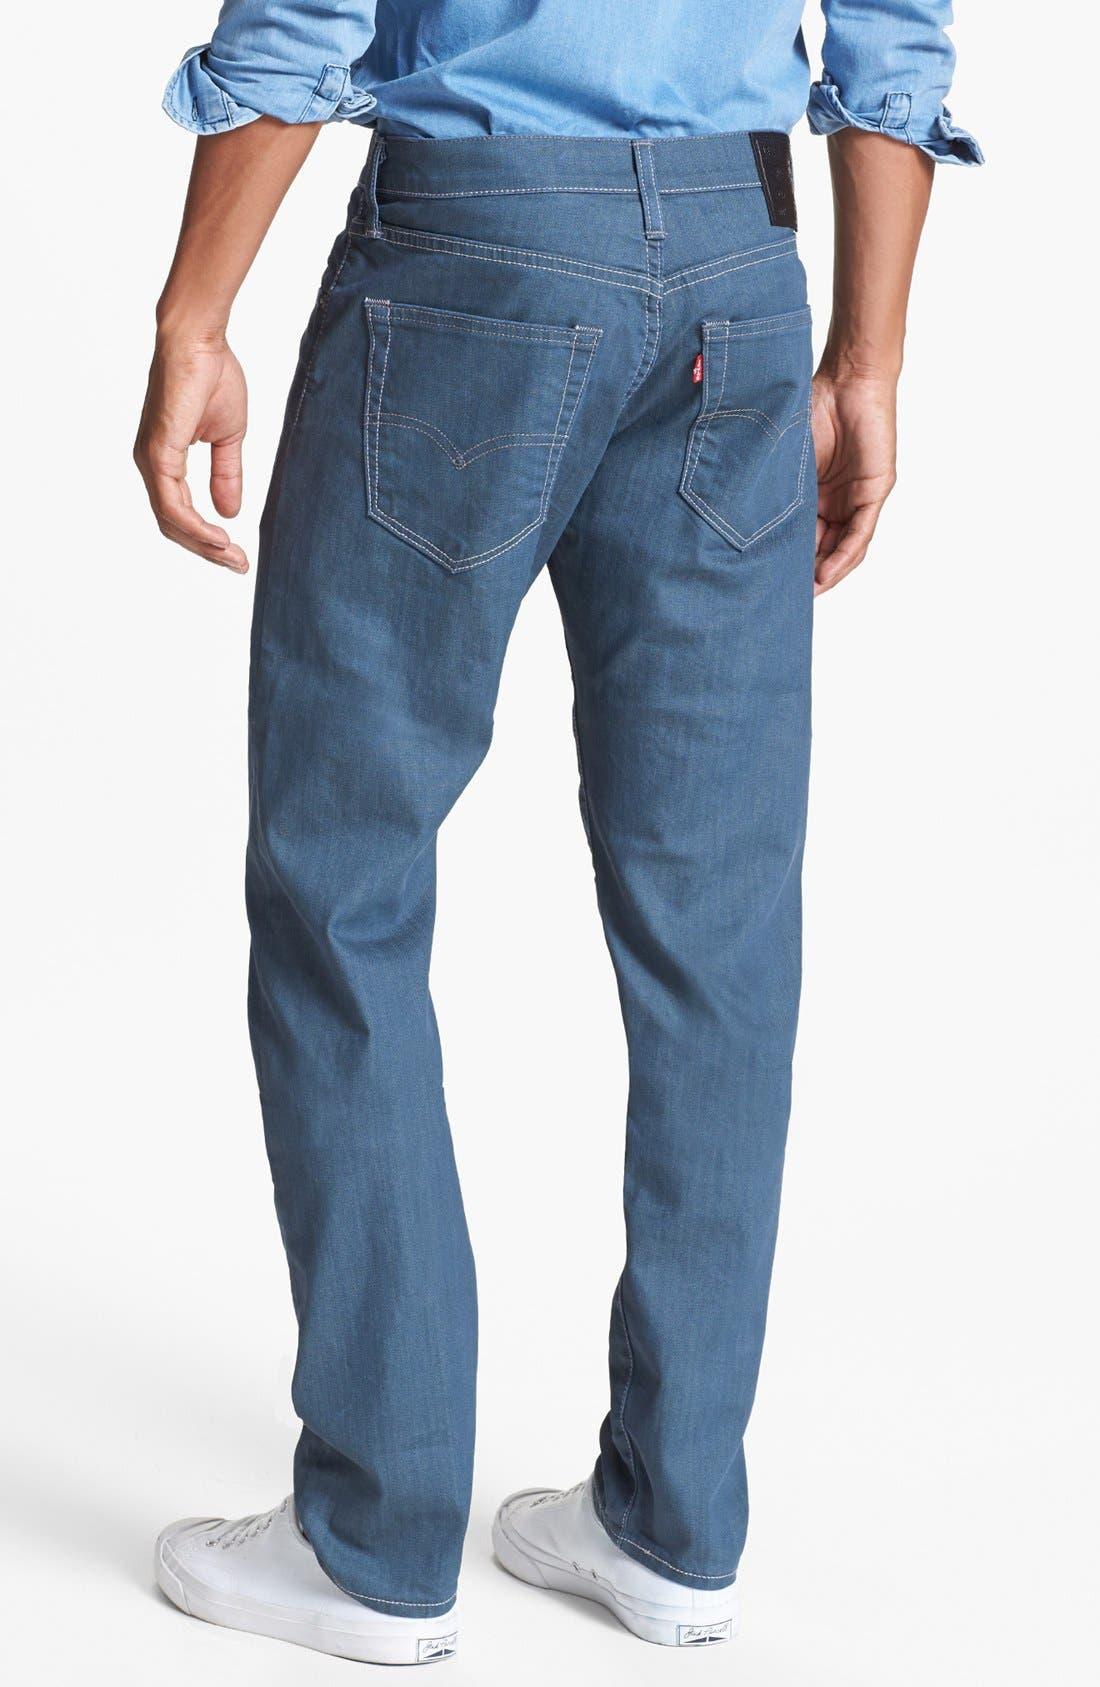 Alternate Image 1 Selected - Levi's® '508™' Skinny Fit Jeans (Nebula)